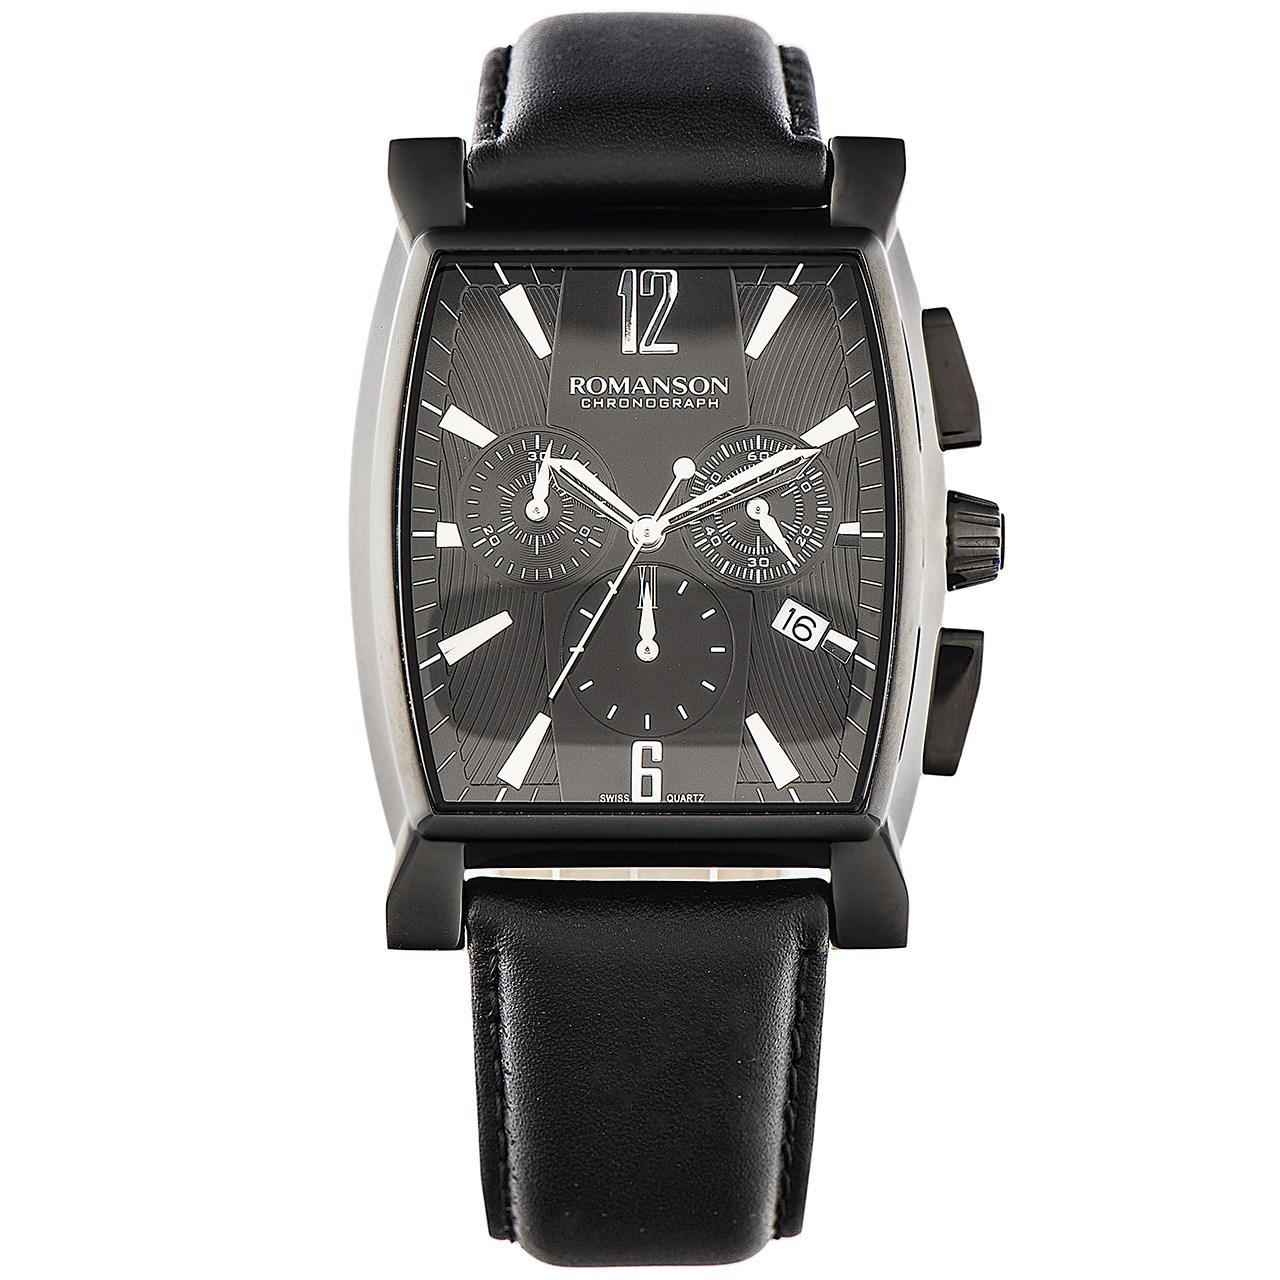 ساعت مچی عقربه ای مردانه رومانسون مدل TL1249HM1BB32W 17